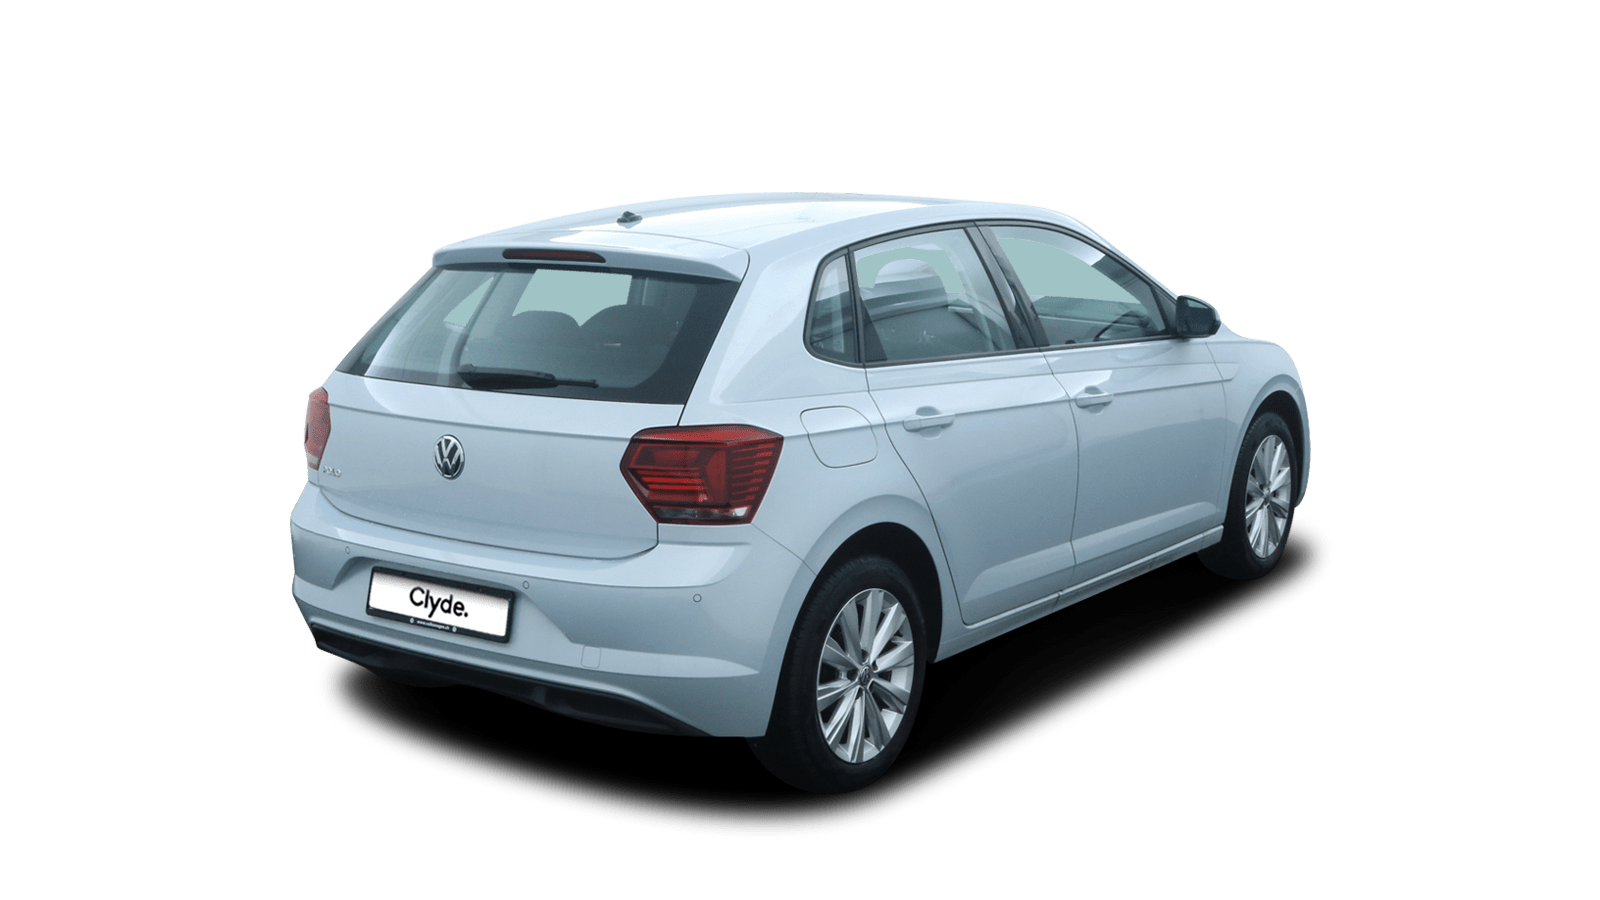 VW Polo Silver back - Clyde car subscription